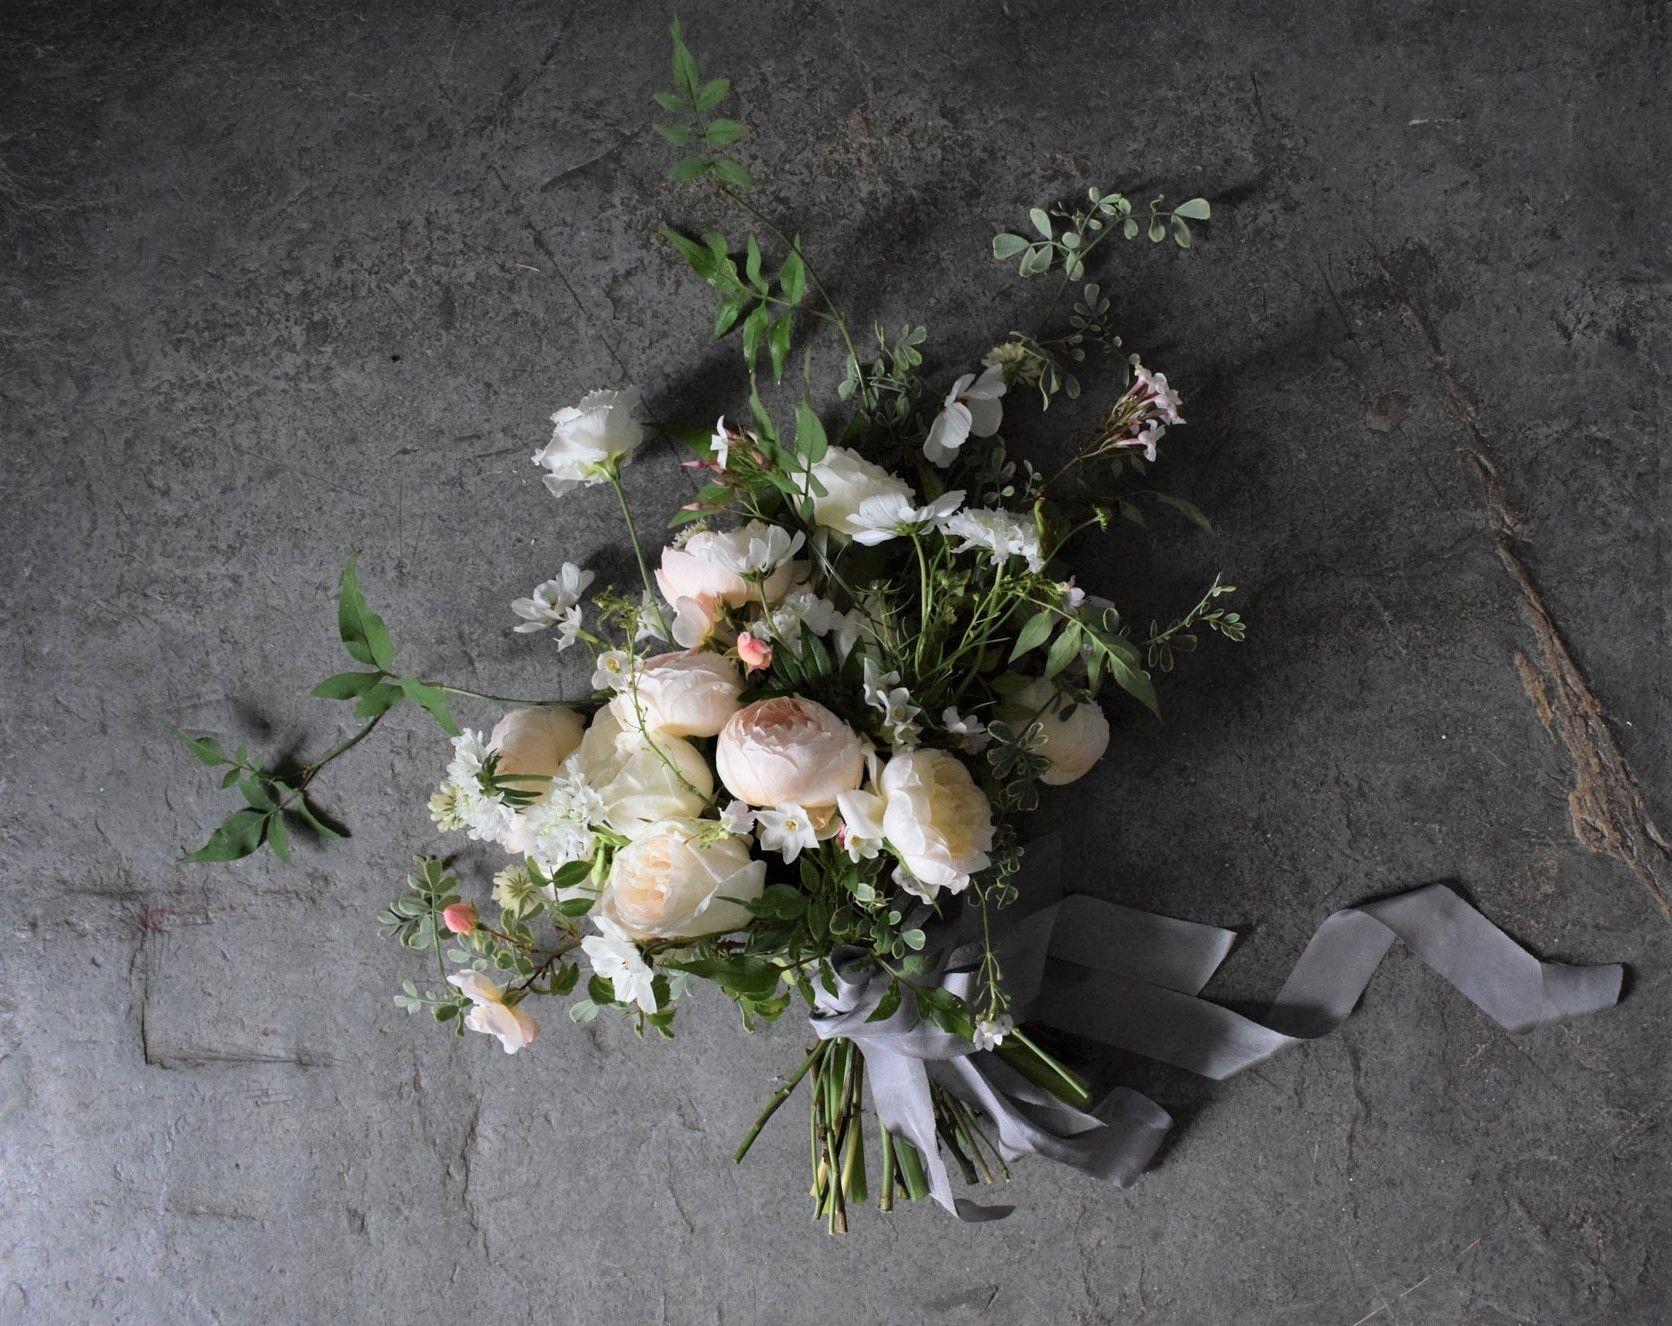 miranda hackett flowers miranda hackett flowers 3ed